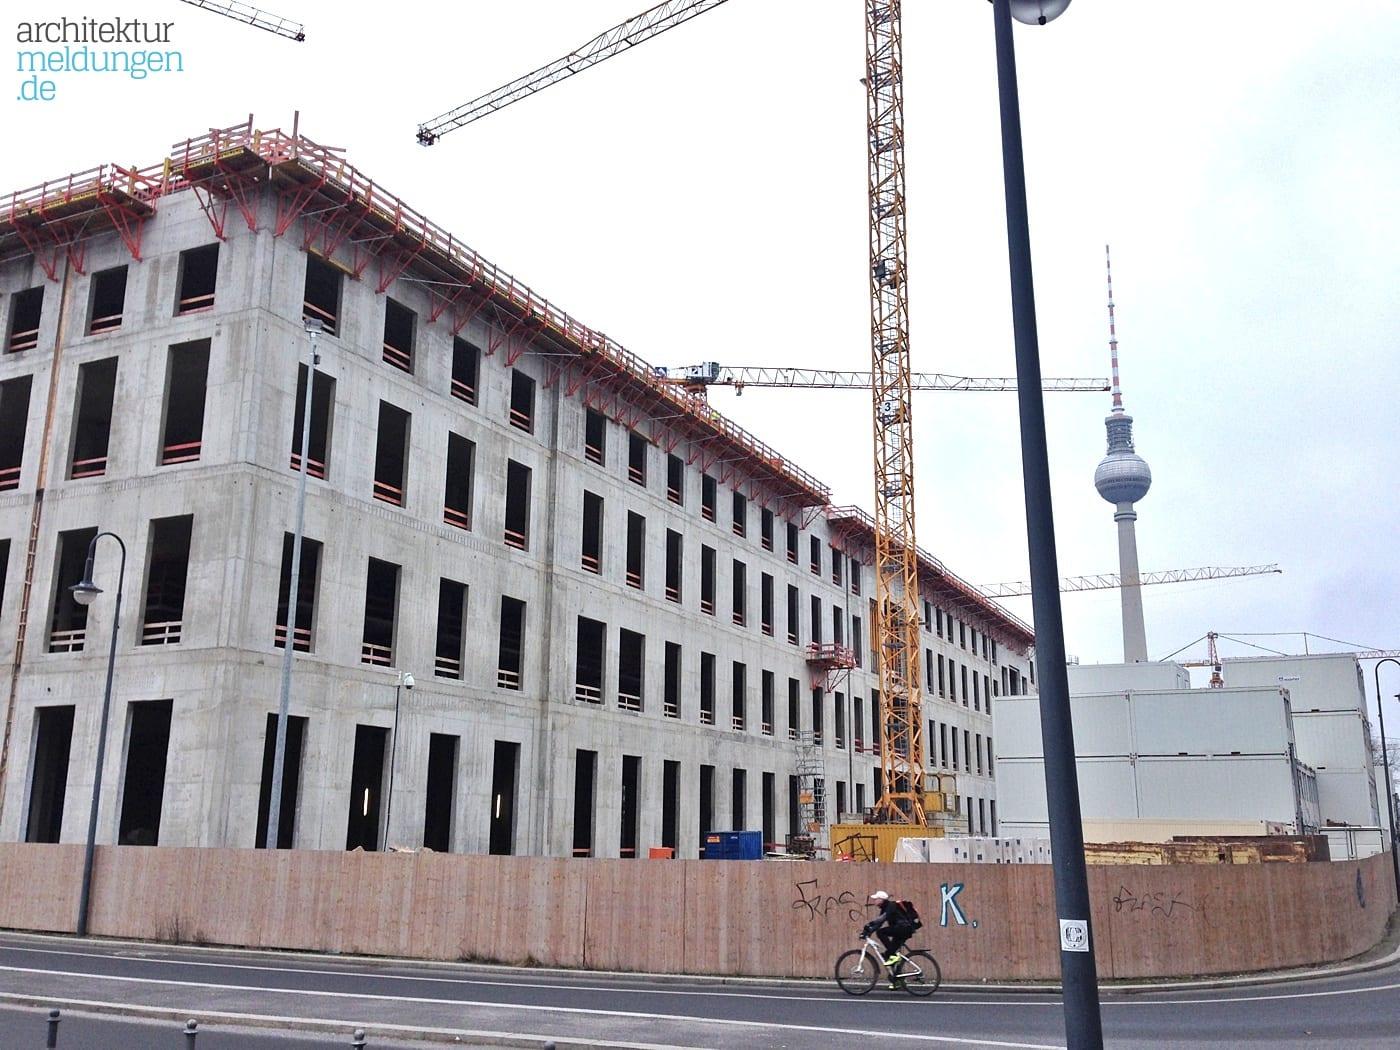 rohbau-stadtschloss-berlin-baustelle-januar-2015-foto-eric-sturm-IMG_1086.jpg